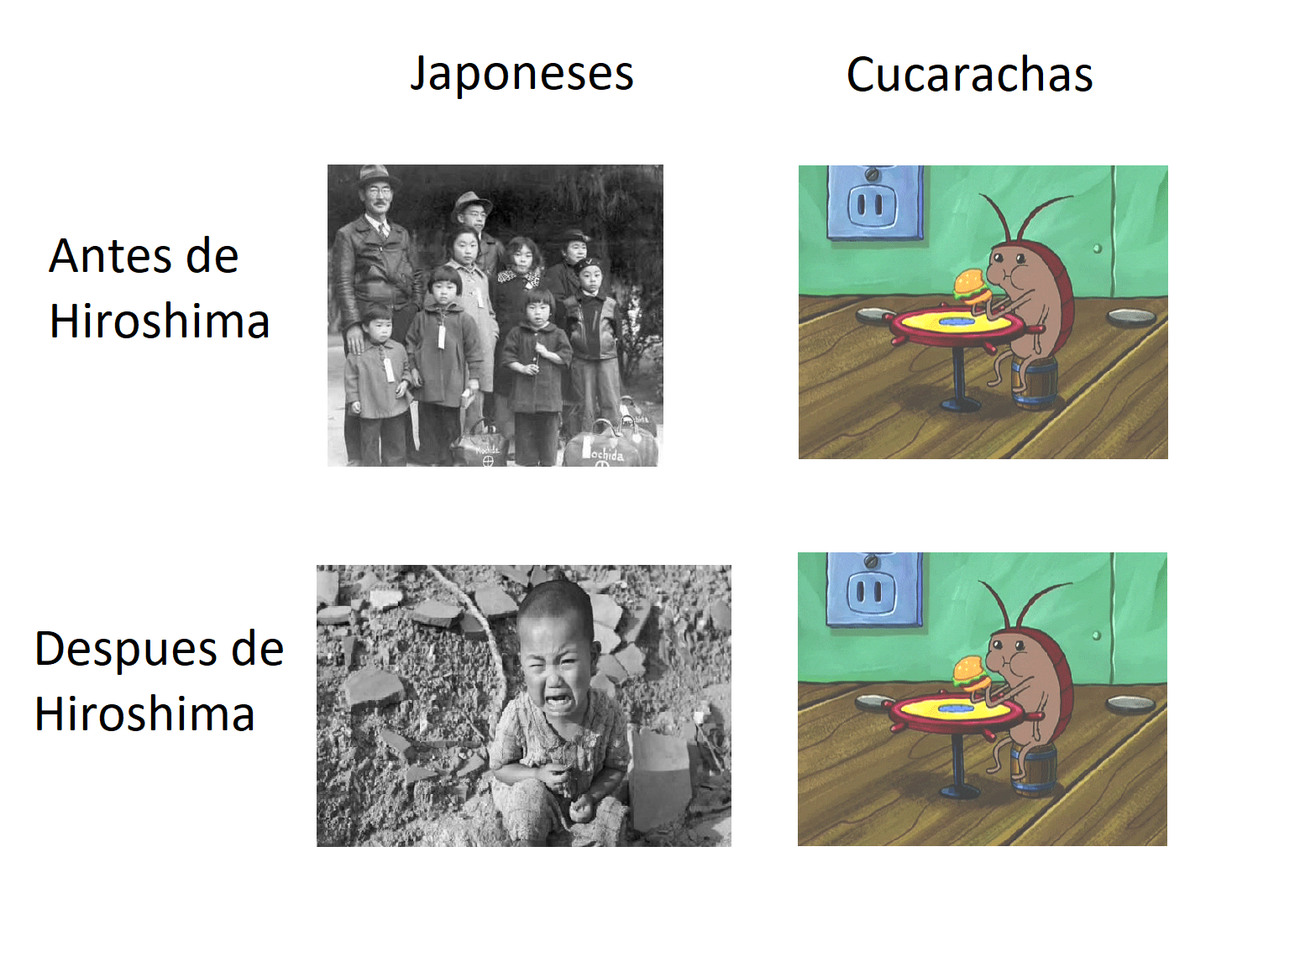 las cucarachas immortales - meme